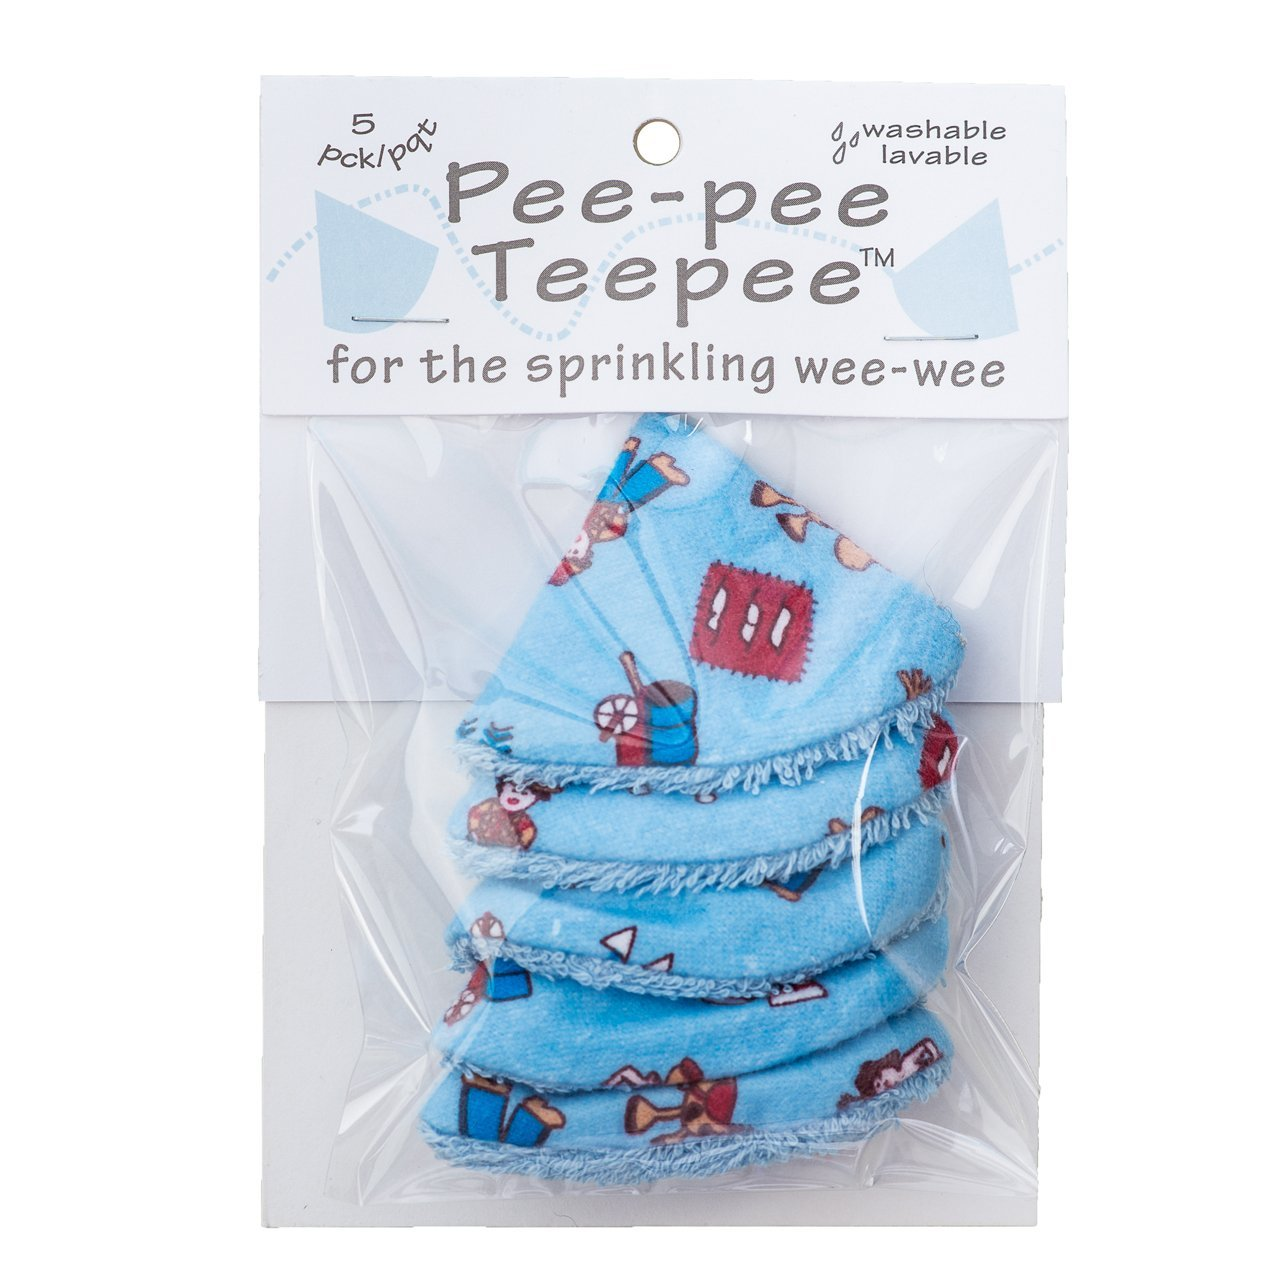 Pee-pee Teepee Wild West Blue - Cello Bag Beba Bean PT3051